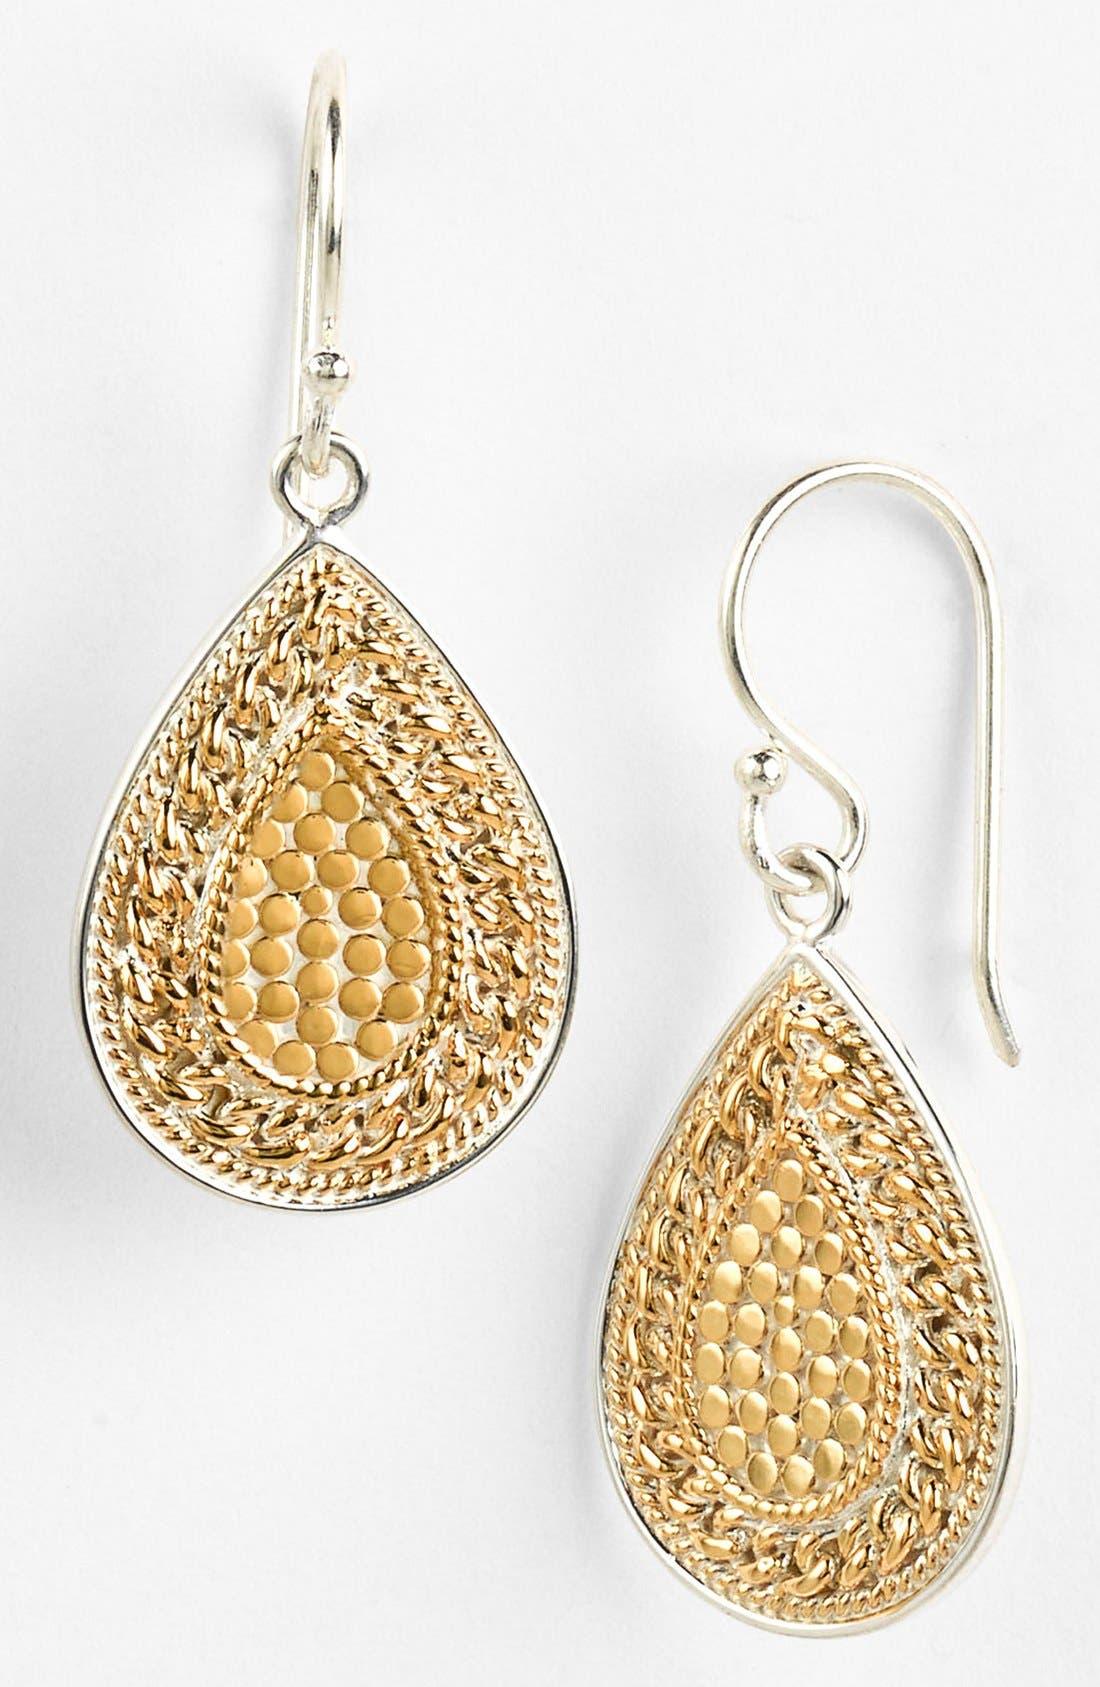 Main Image - Anna Beck 'Gili' Teardrop Earrings